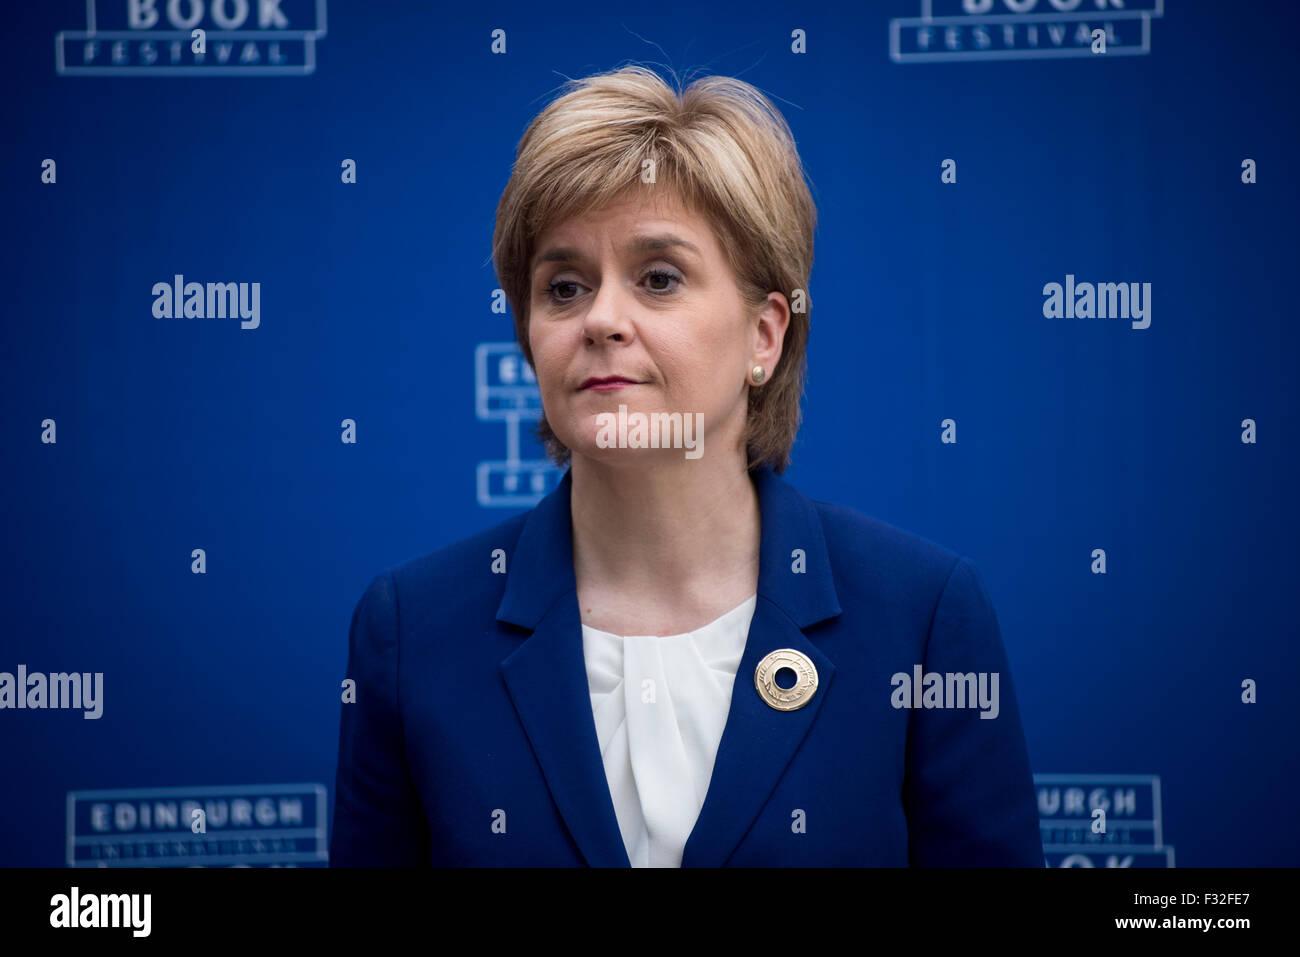 Scottish First Minister Nicola Sturgeon. - Stock Image